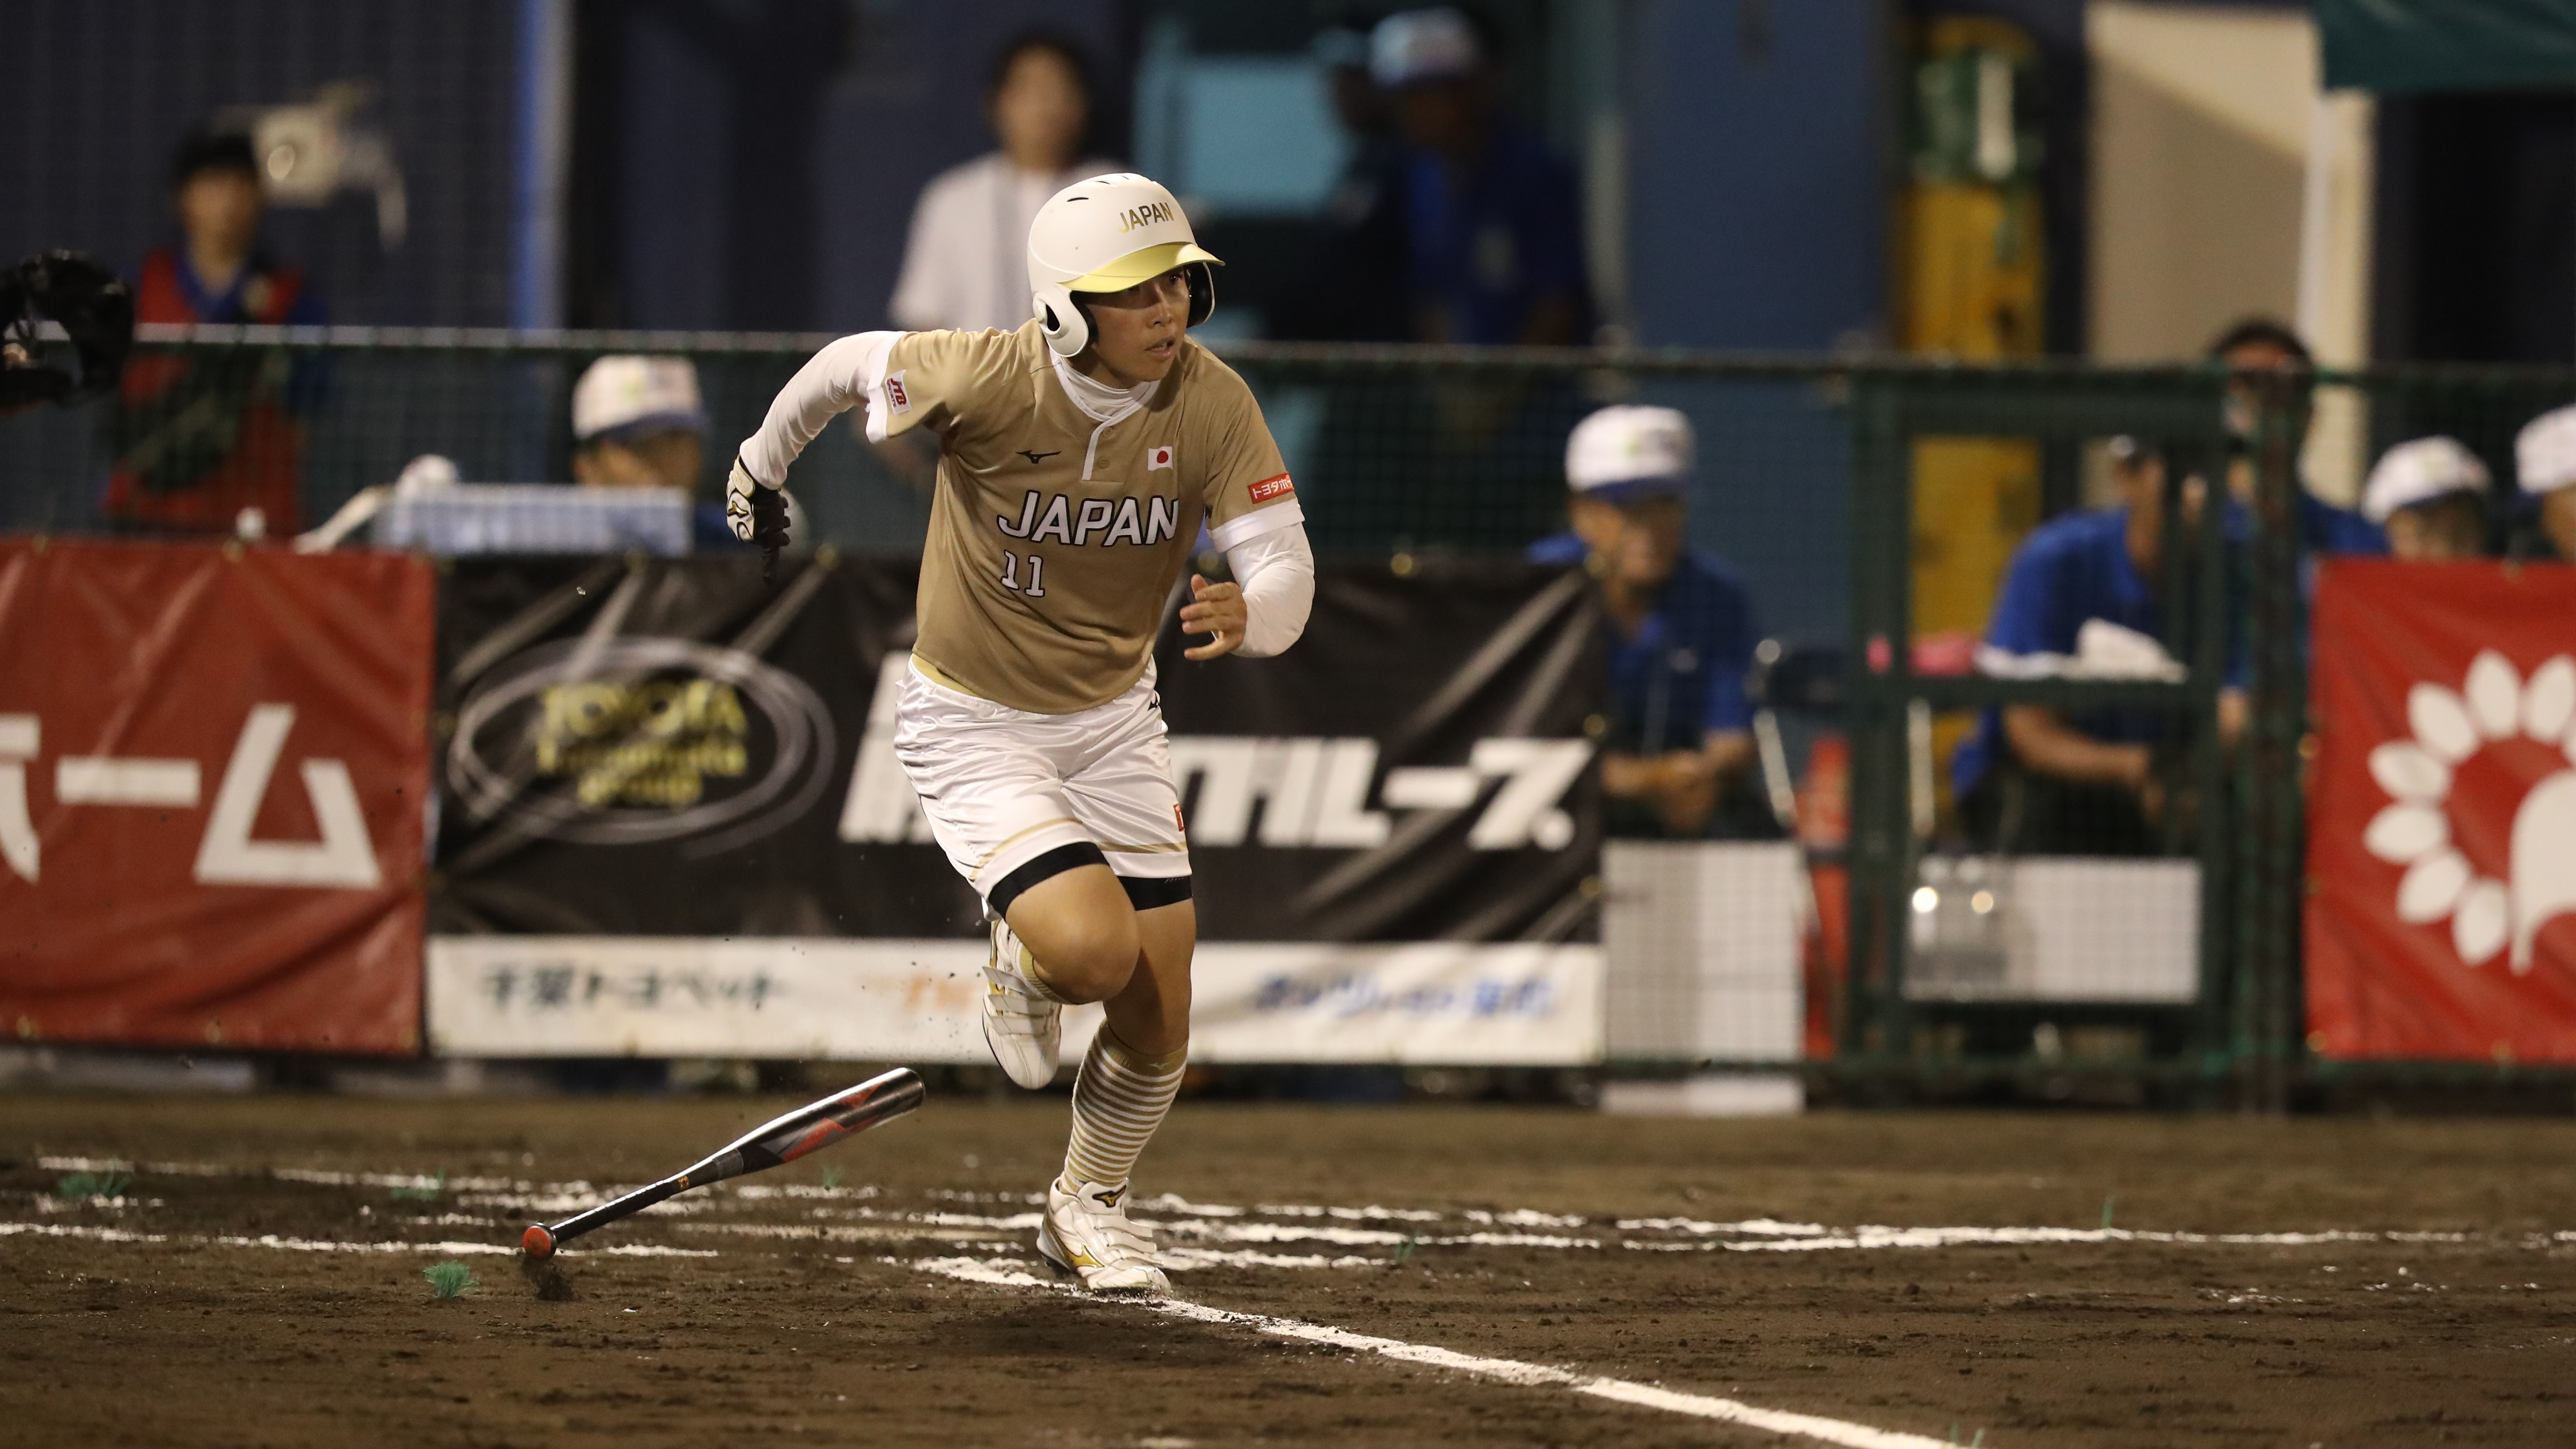 Eri Yamada runs the bases